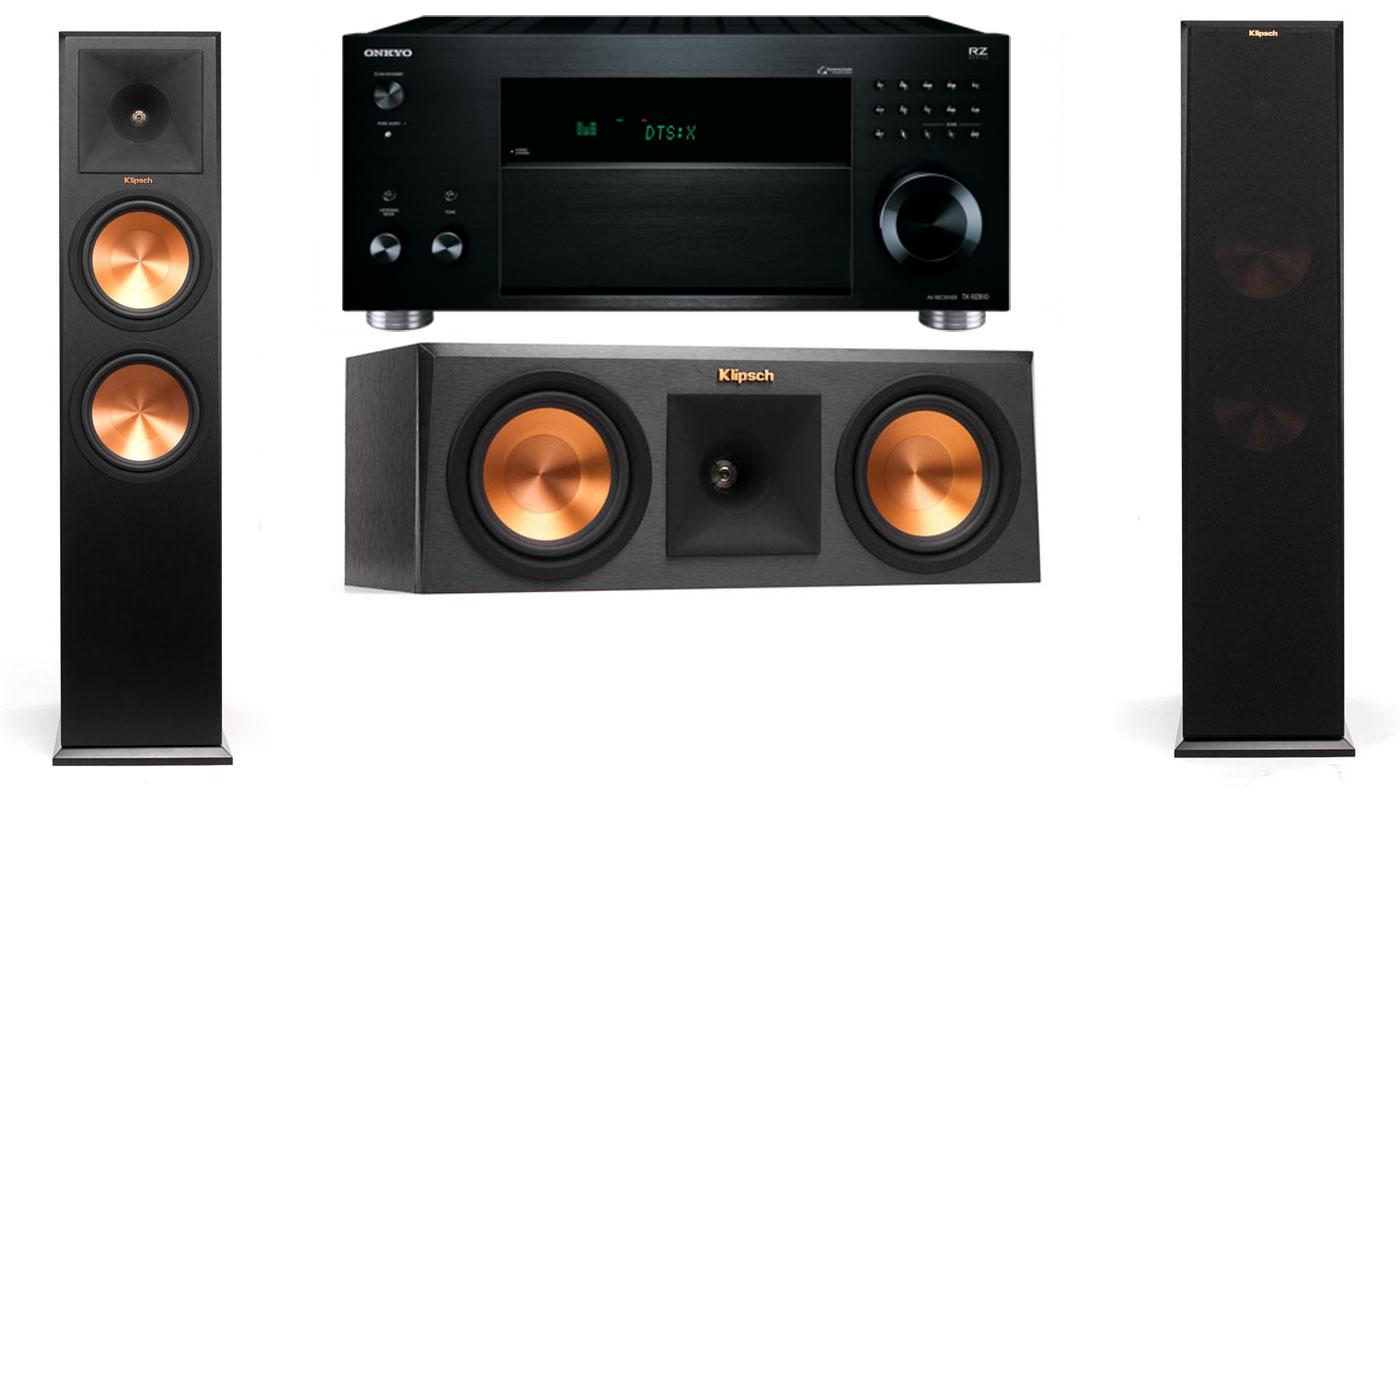 Klipsch RP-280F Tower Speakers-RP-250C-Onkyo TX-RZ810